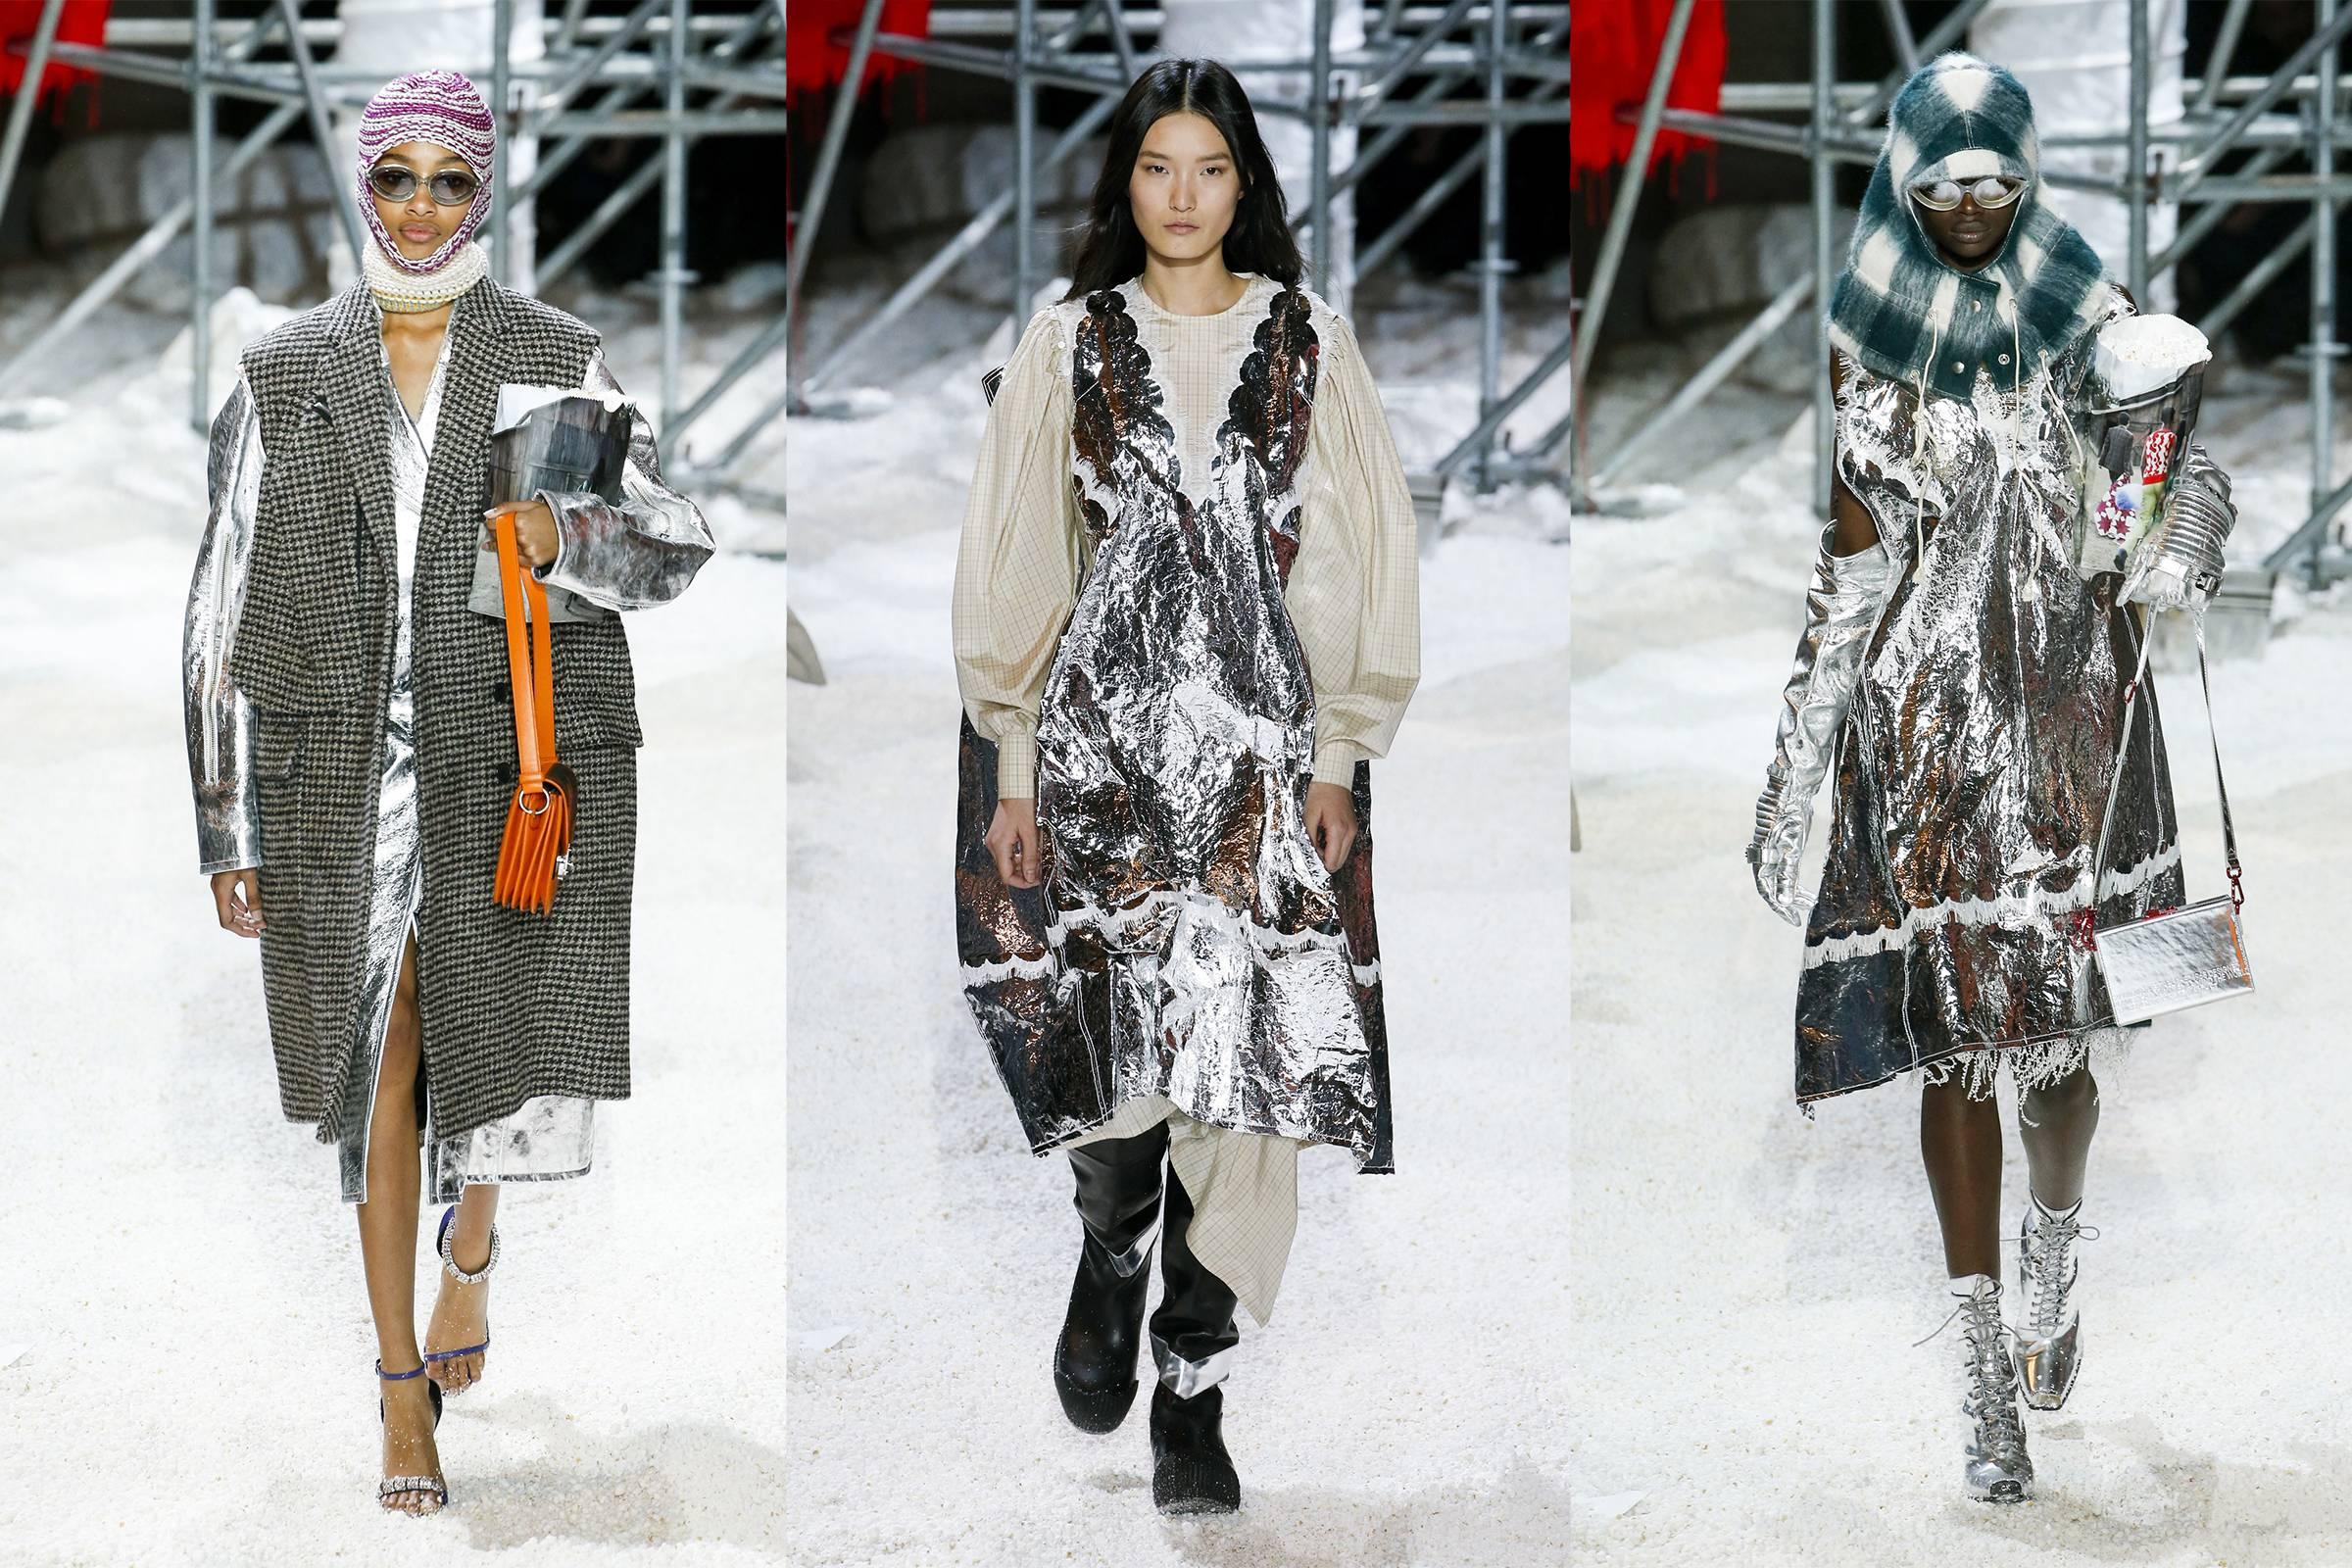 Calvin Klein Fall/Winter 2018 ready-to-wear collection